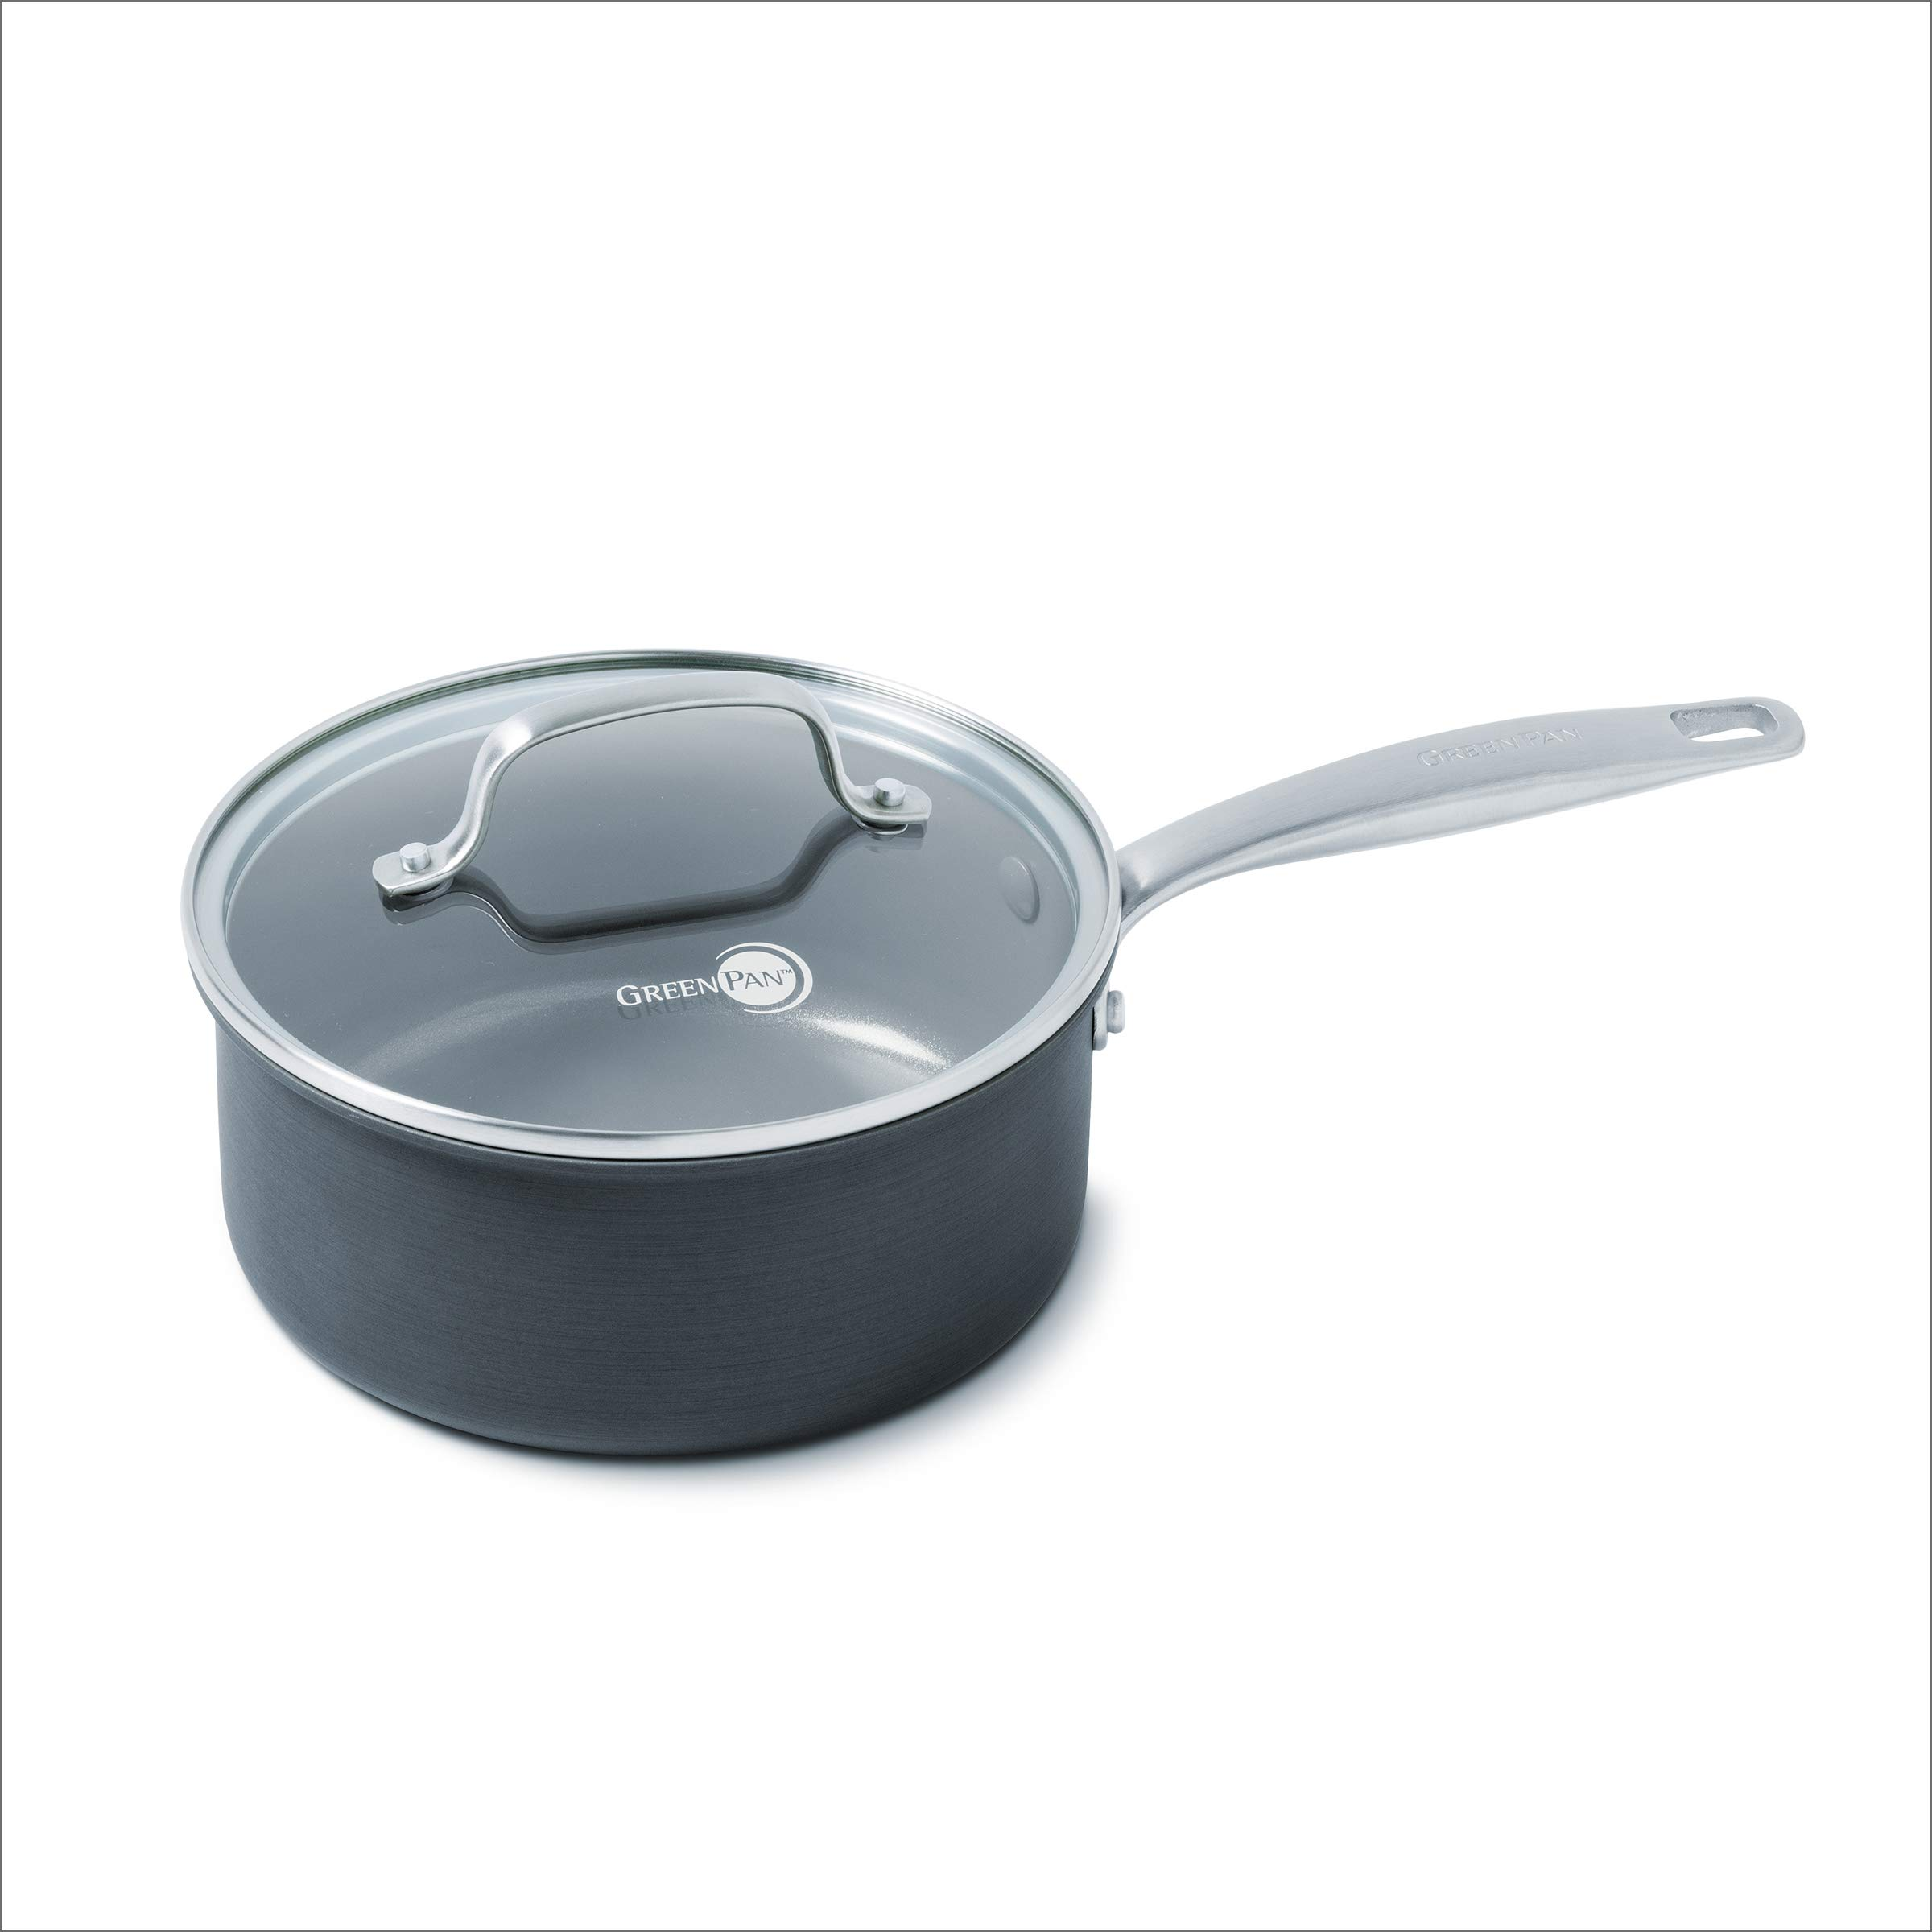 GreenPan Chatham Ceramic Non-Stick Covered Saucepan, 3 quart, Grey by GreenPan